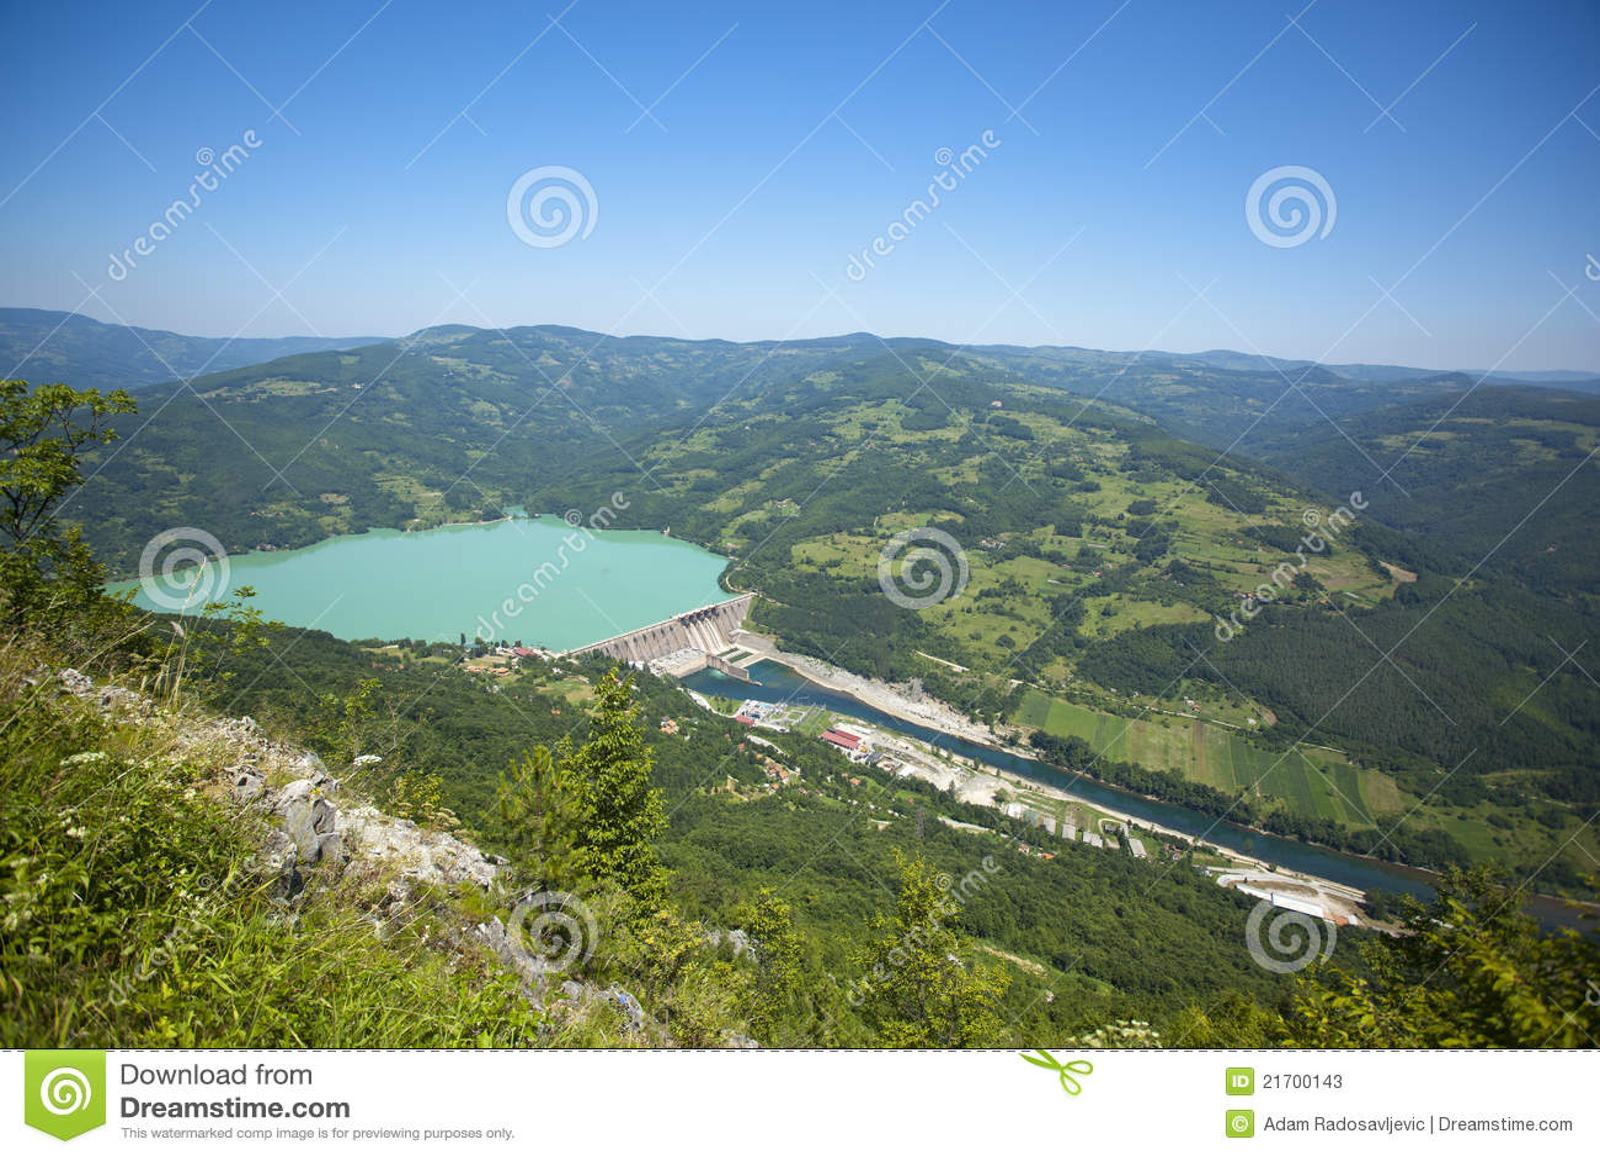 Stazione di forza idroelettrica, diga di Perucac